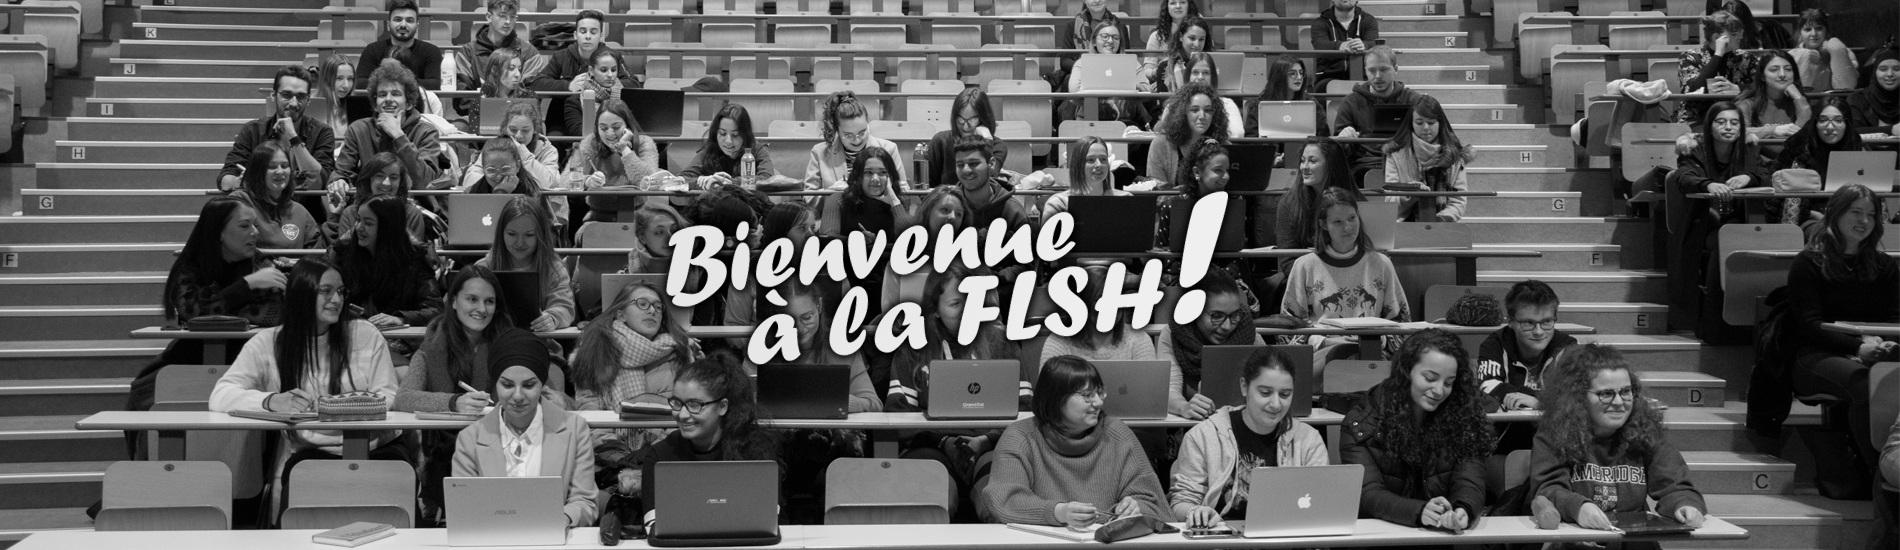 Bienvenue FLSH